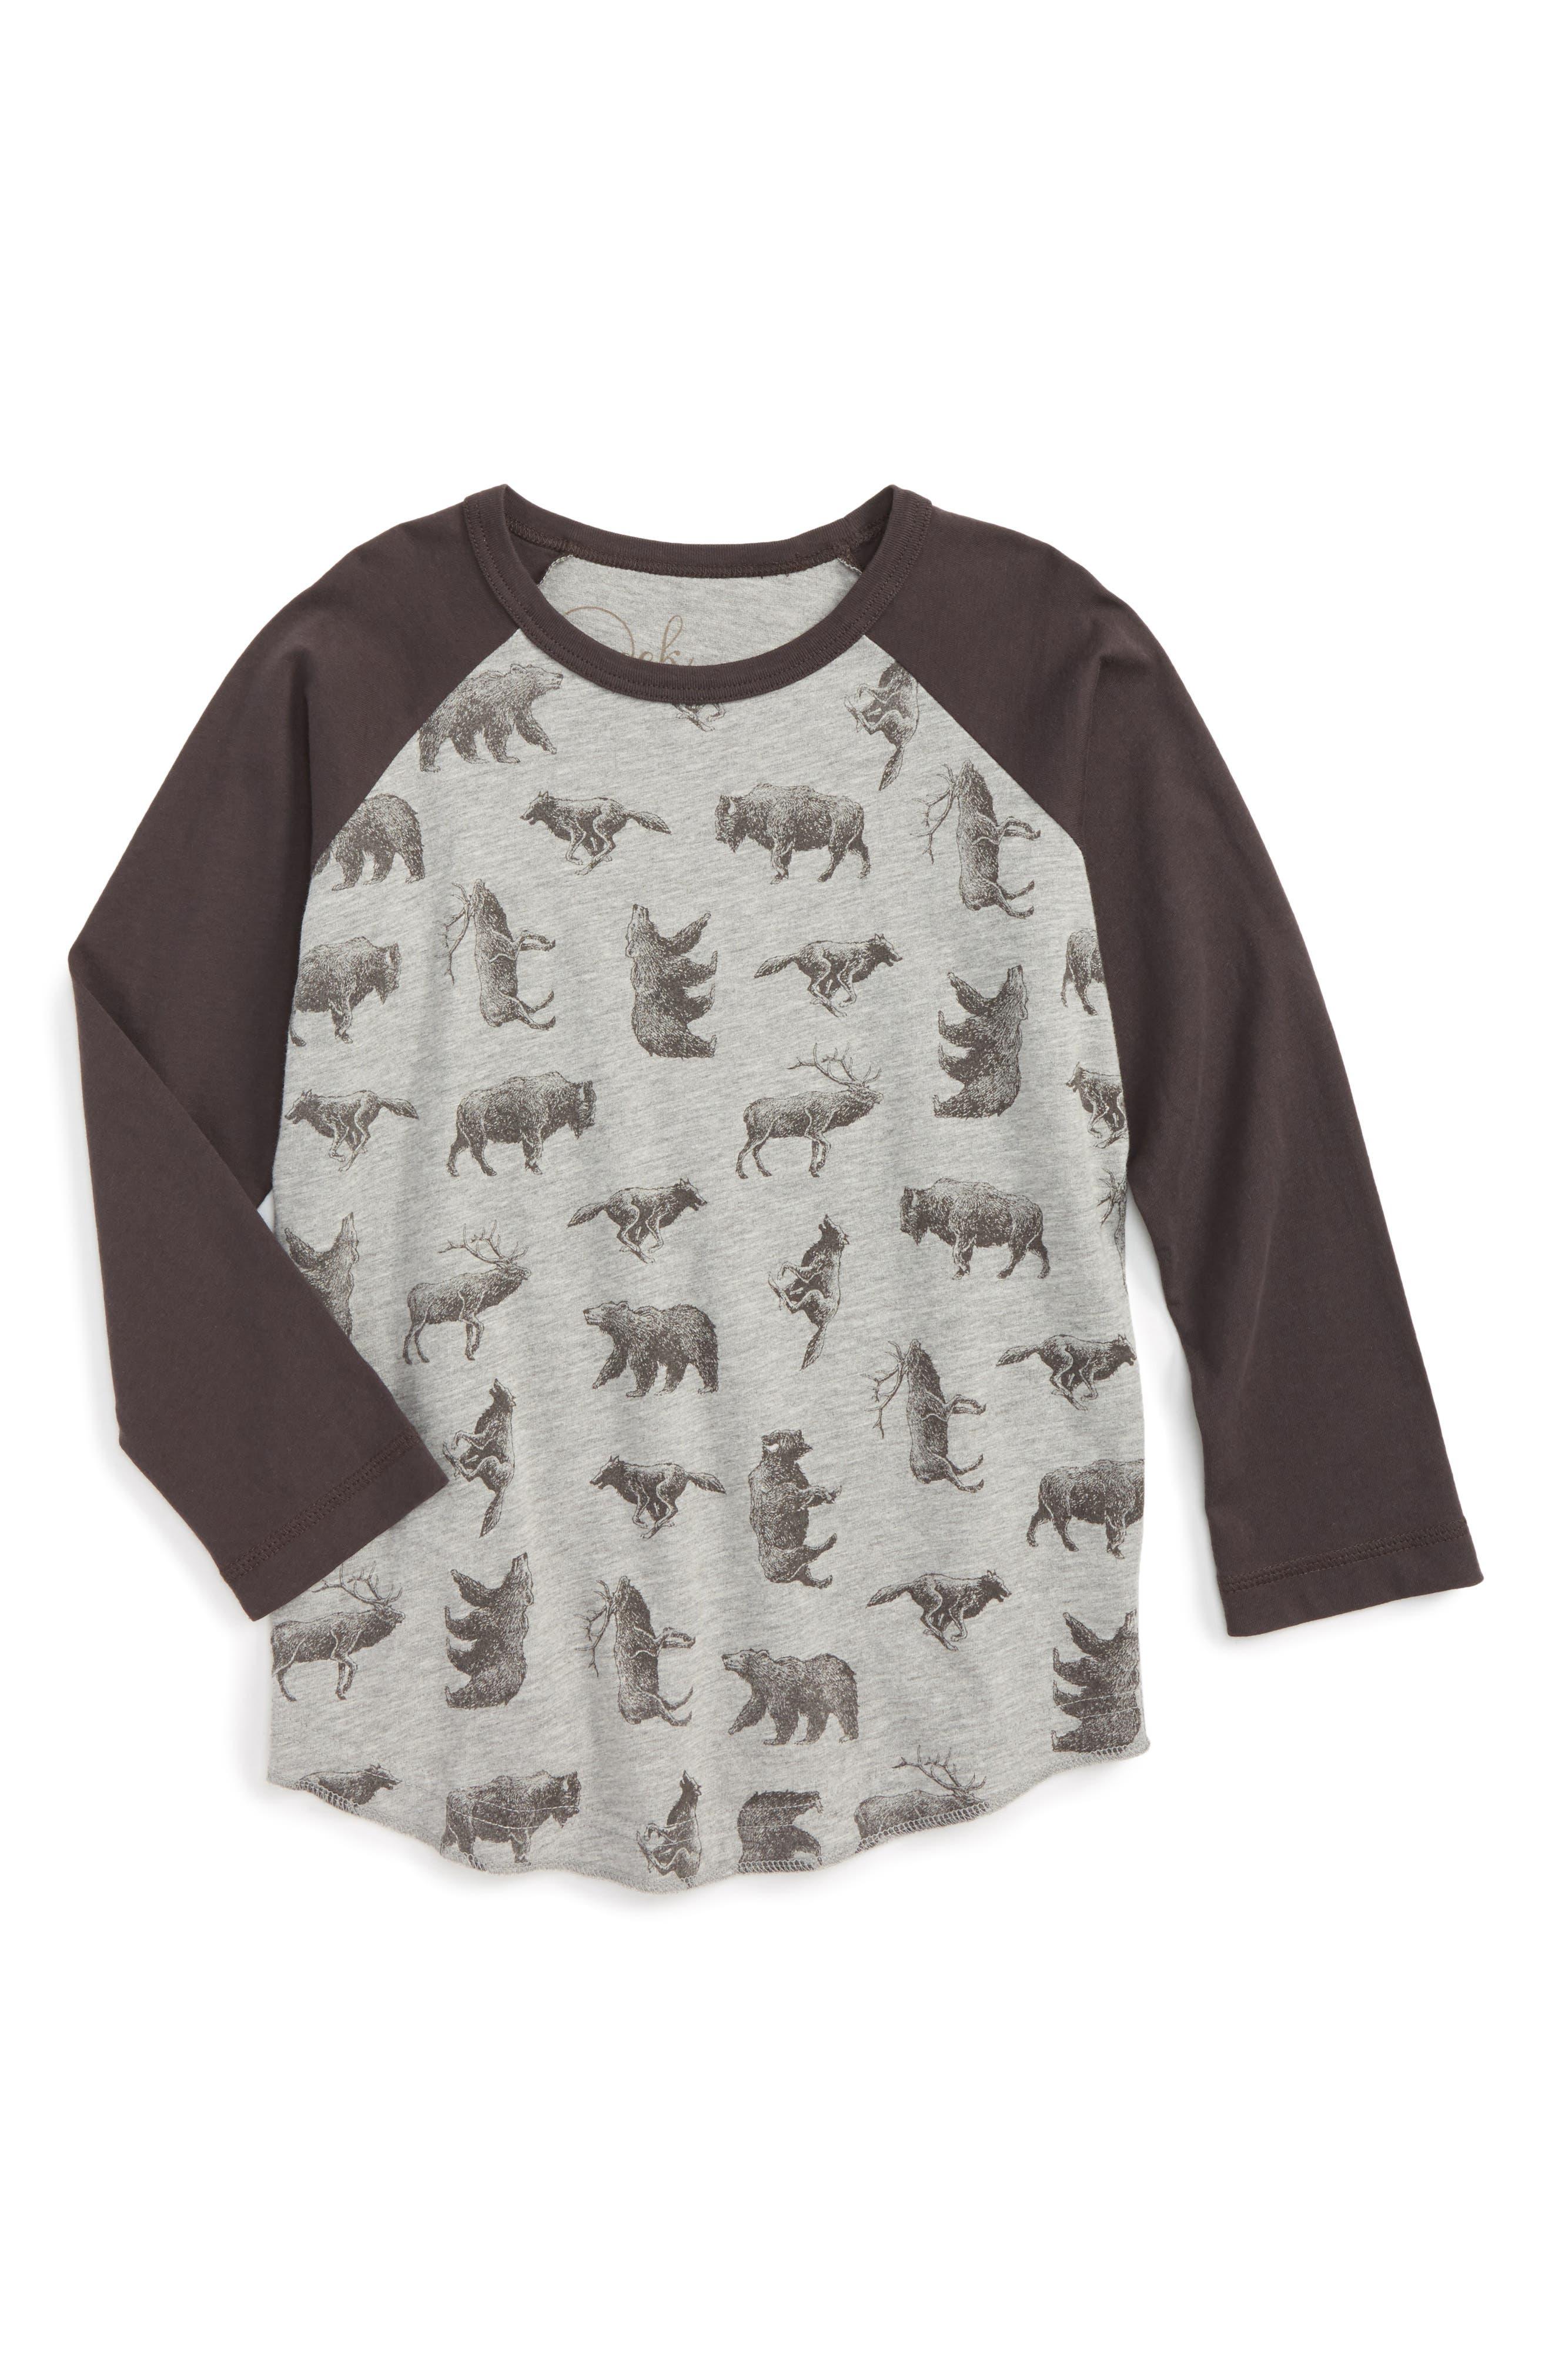 Alternate Image 1 Selected - Peek Animal Print Raglan T-Shirt (Toddler Boys, Little Boys & Big Boys)